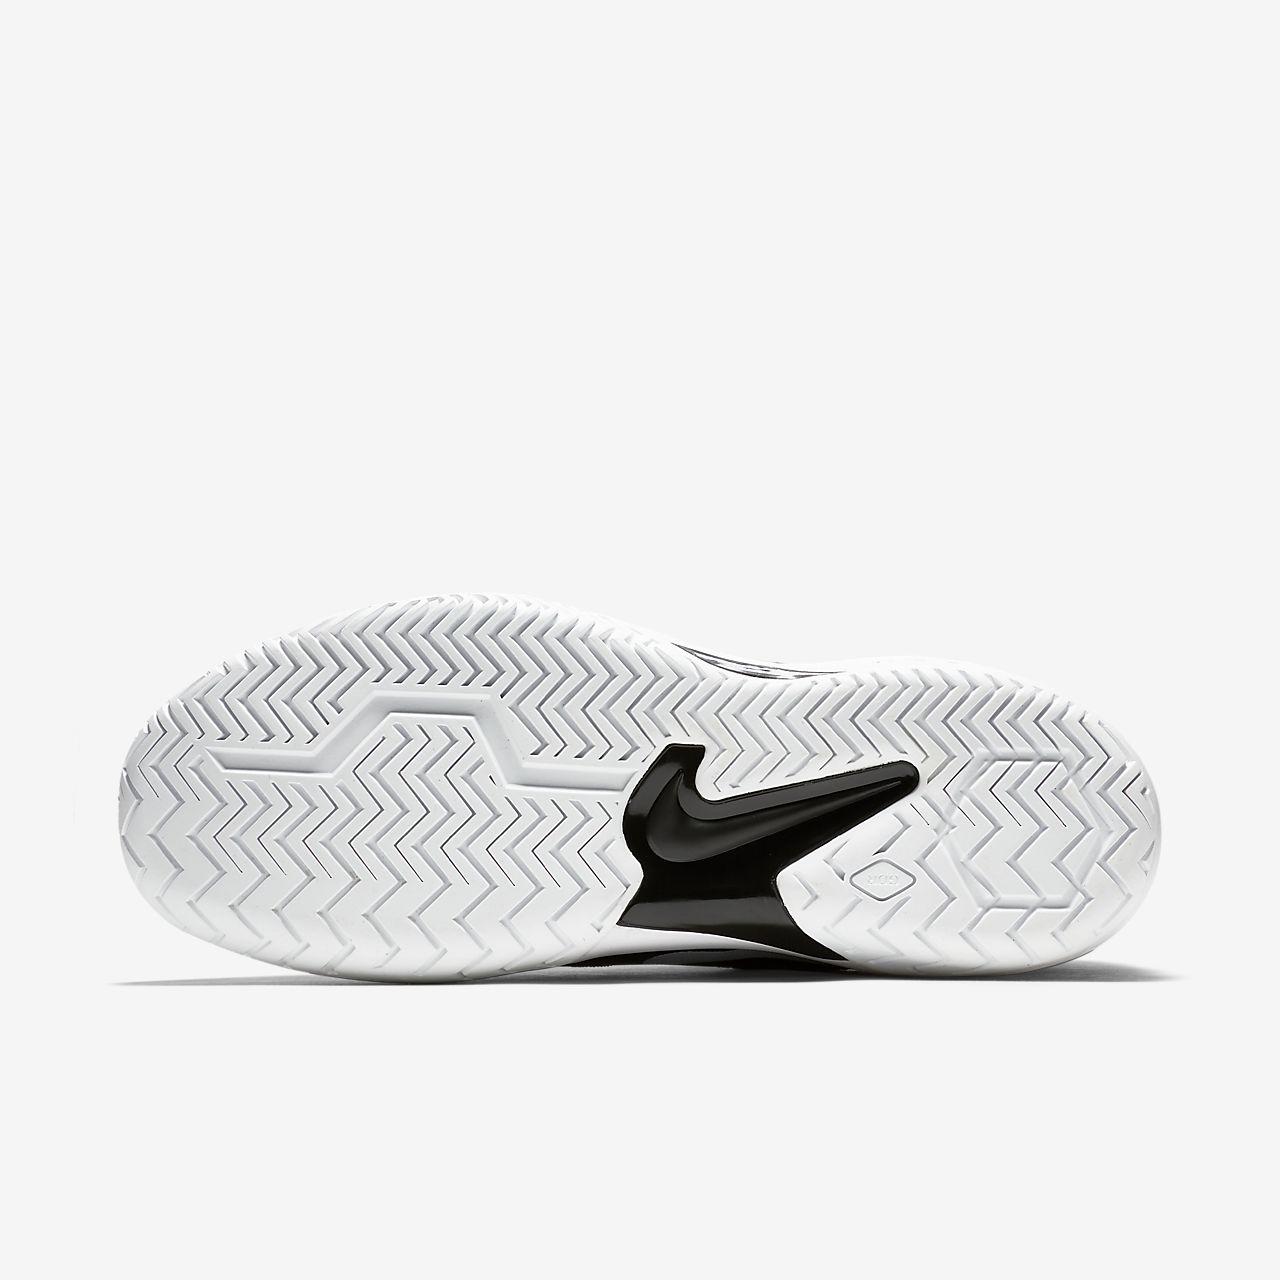 1662b5c379 ... Ανδρικό παπούτσι τένις για σκληρά γήπεδα NikeCourt Air Zoom Resistance